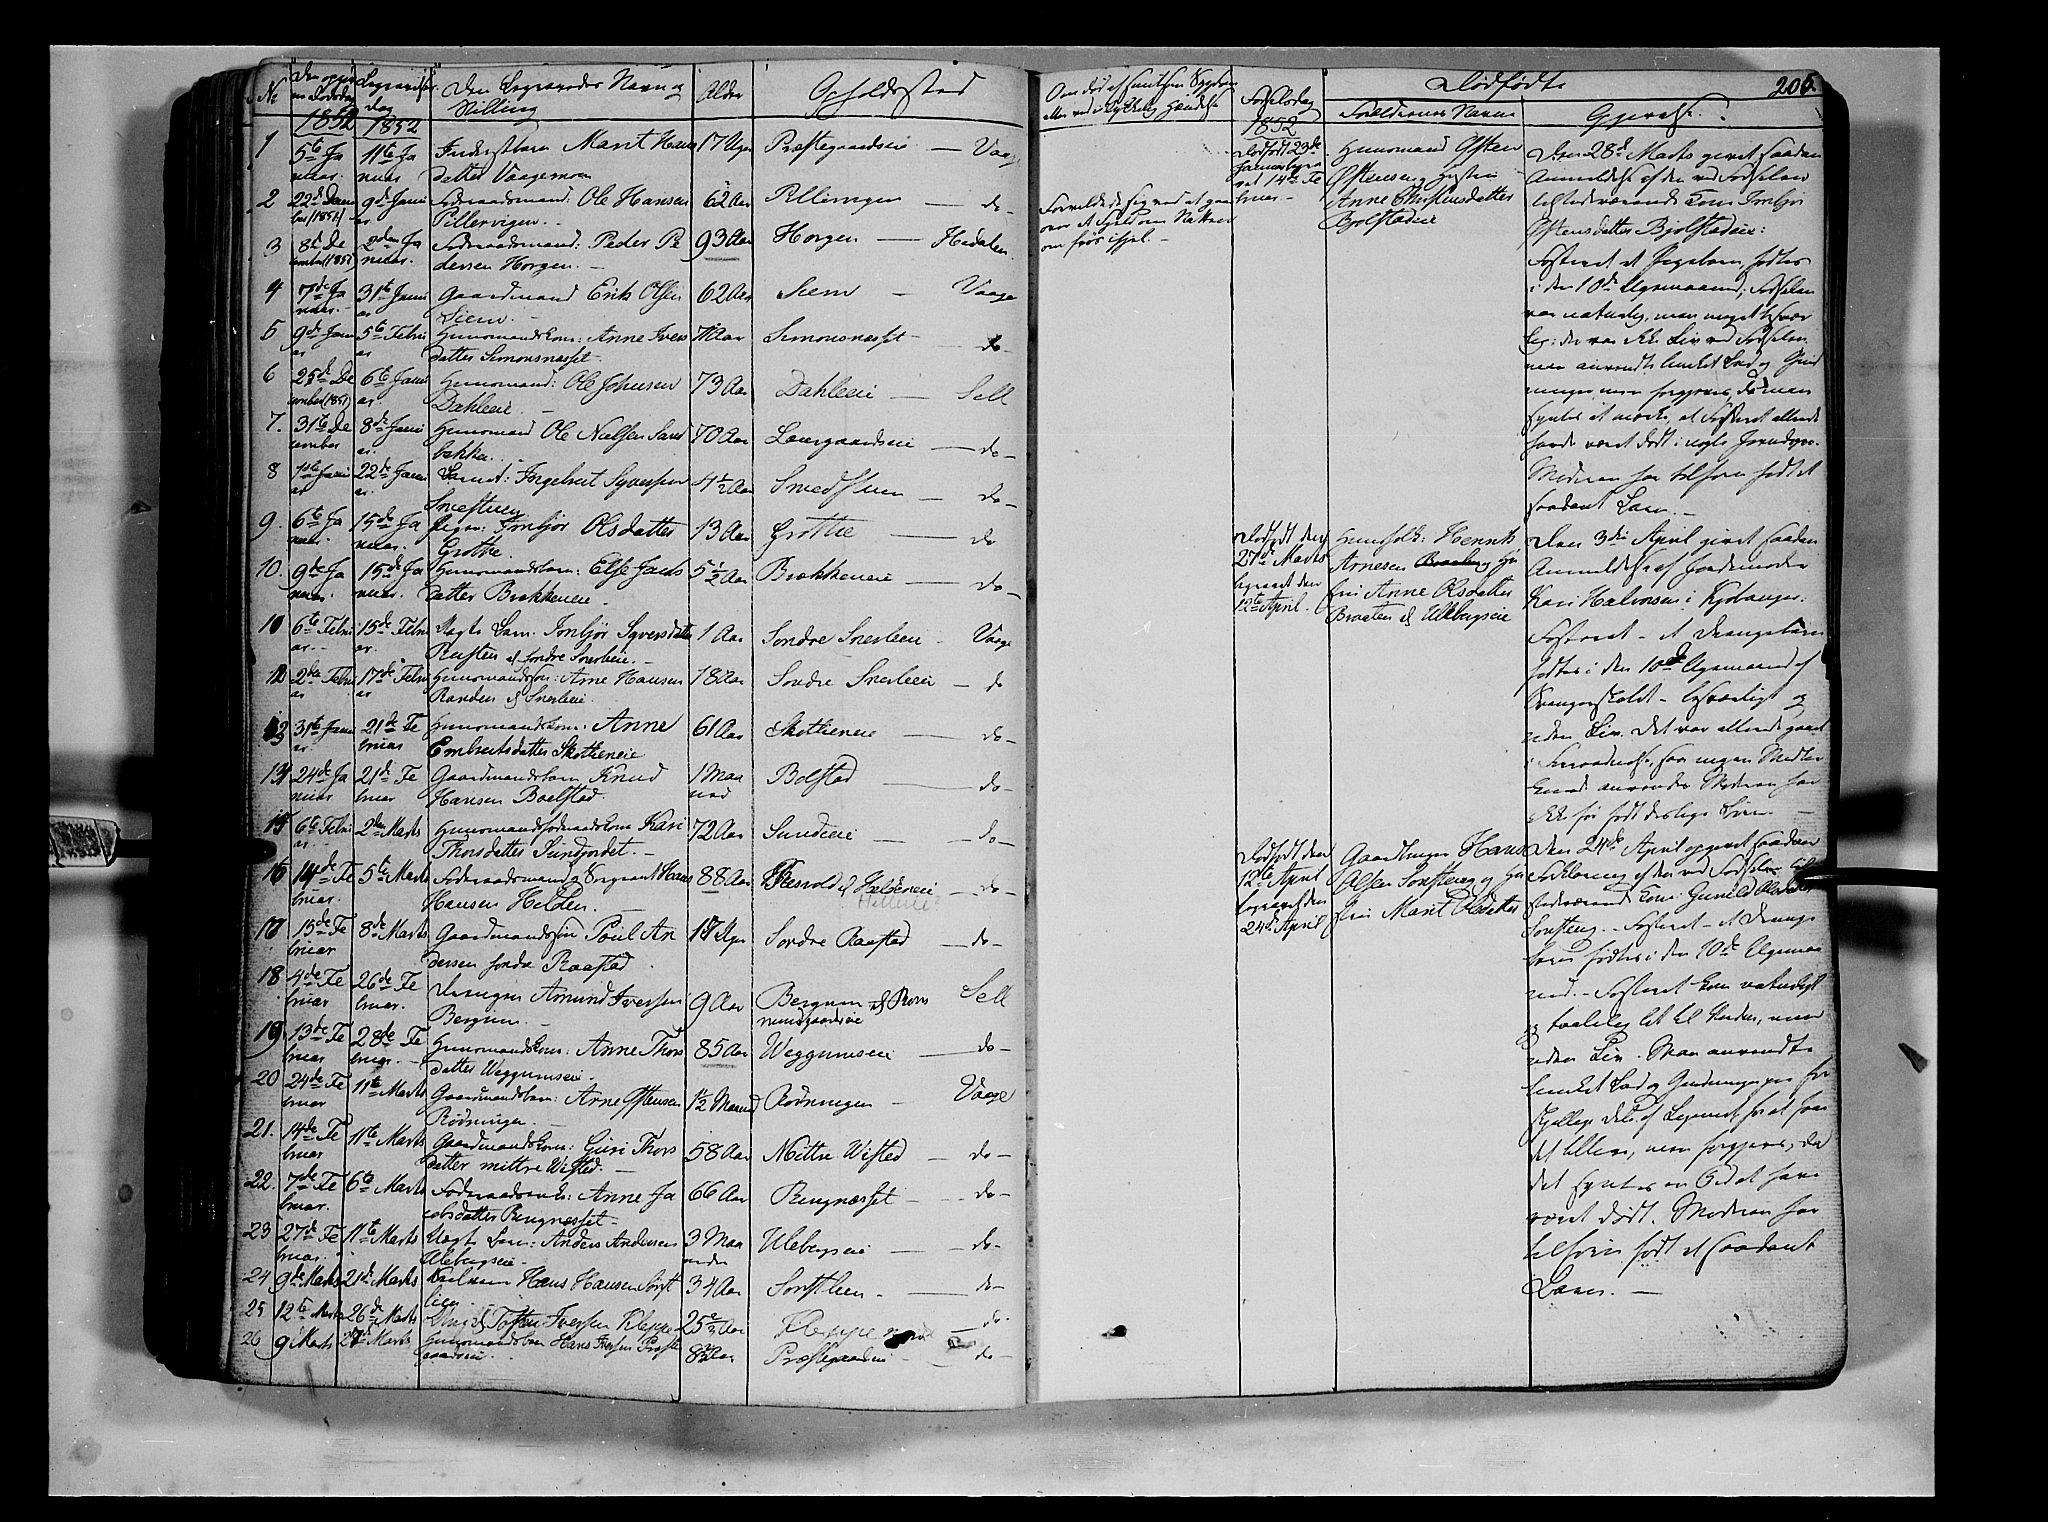 SAH, Vågå prestekontor, Ministerialbok nr. 5 /1, 1842-1856, s. 205